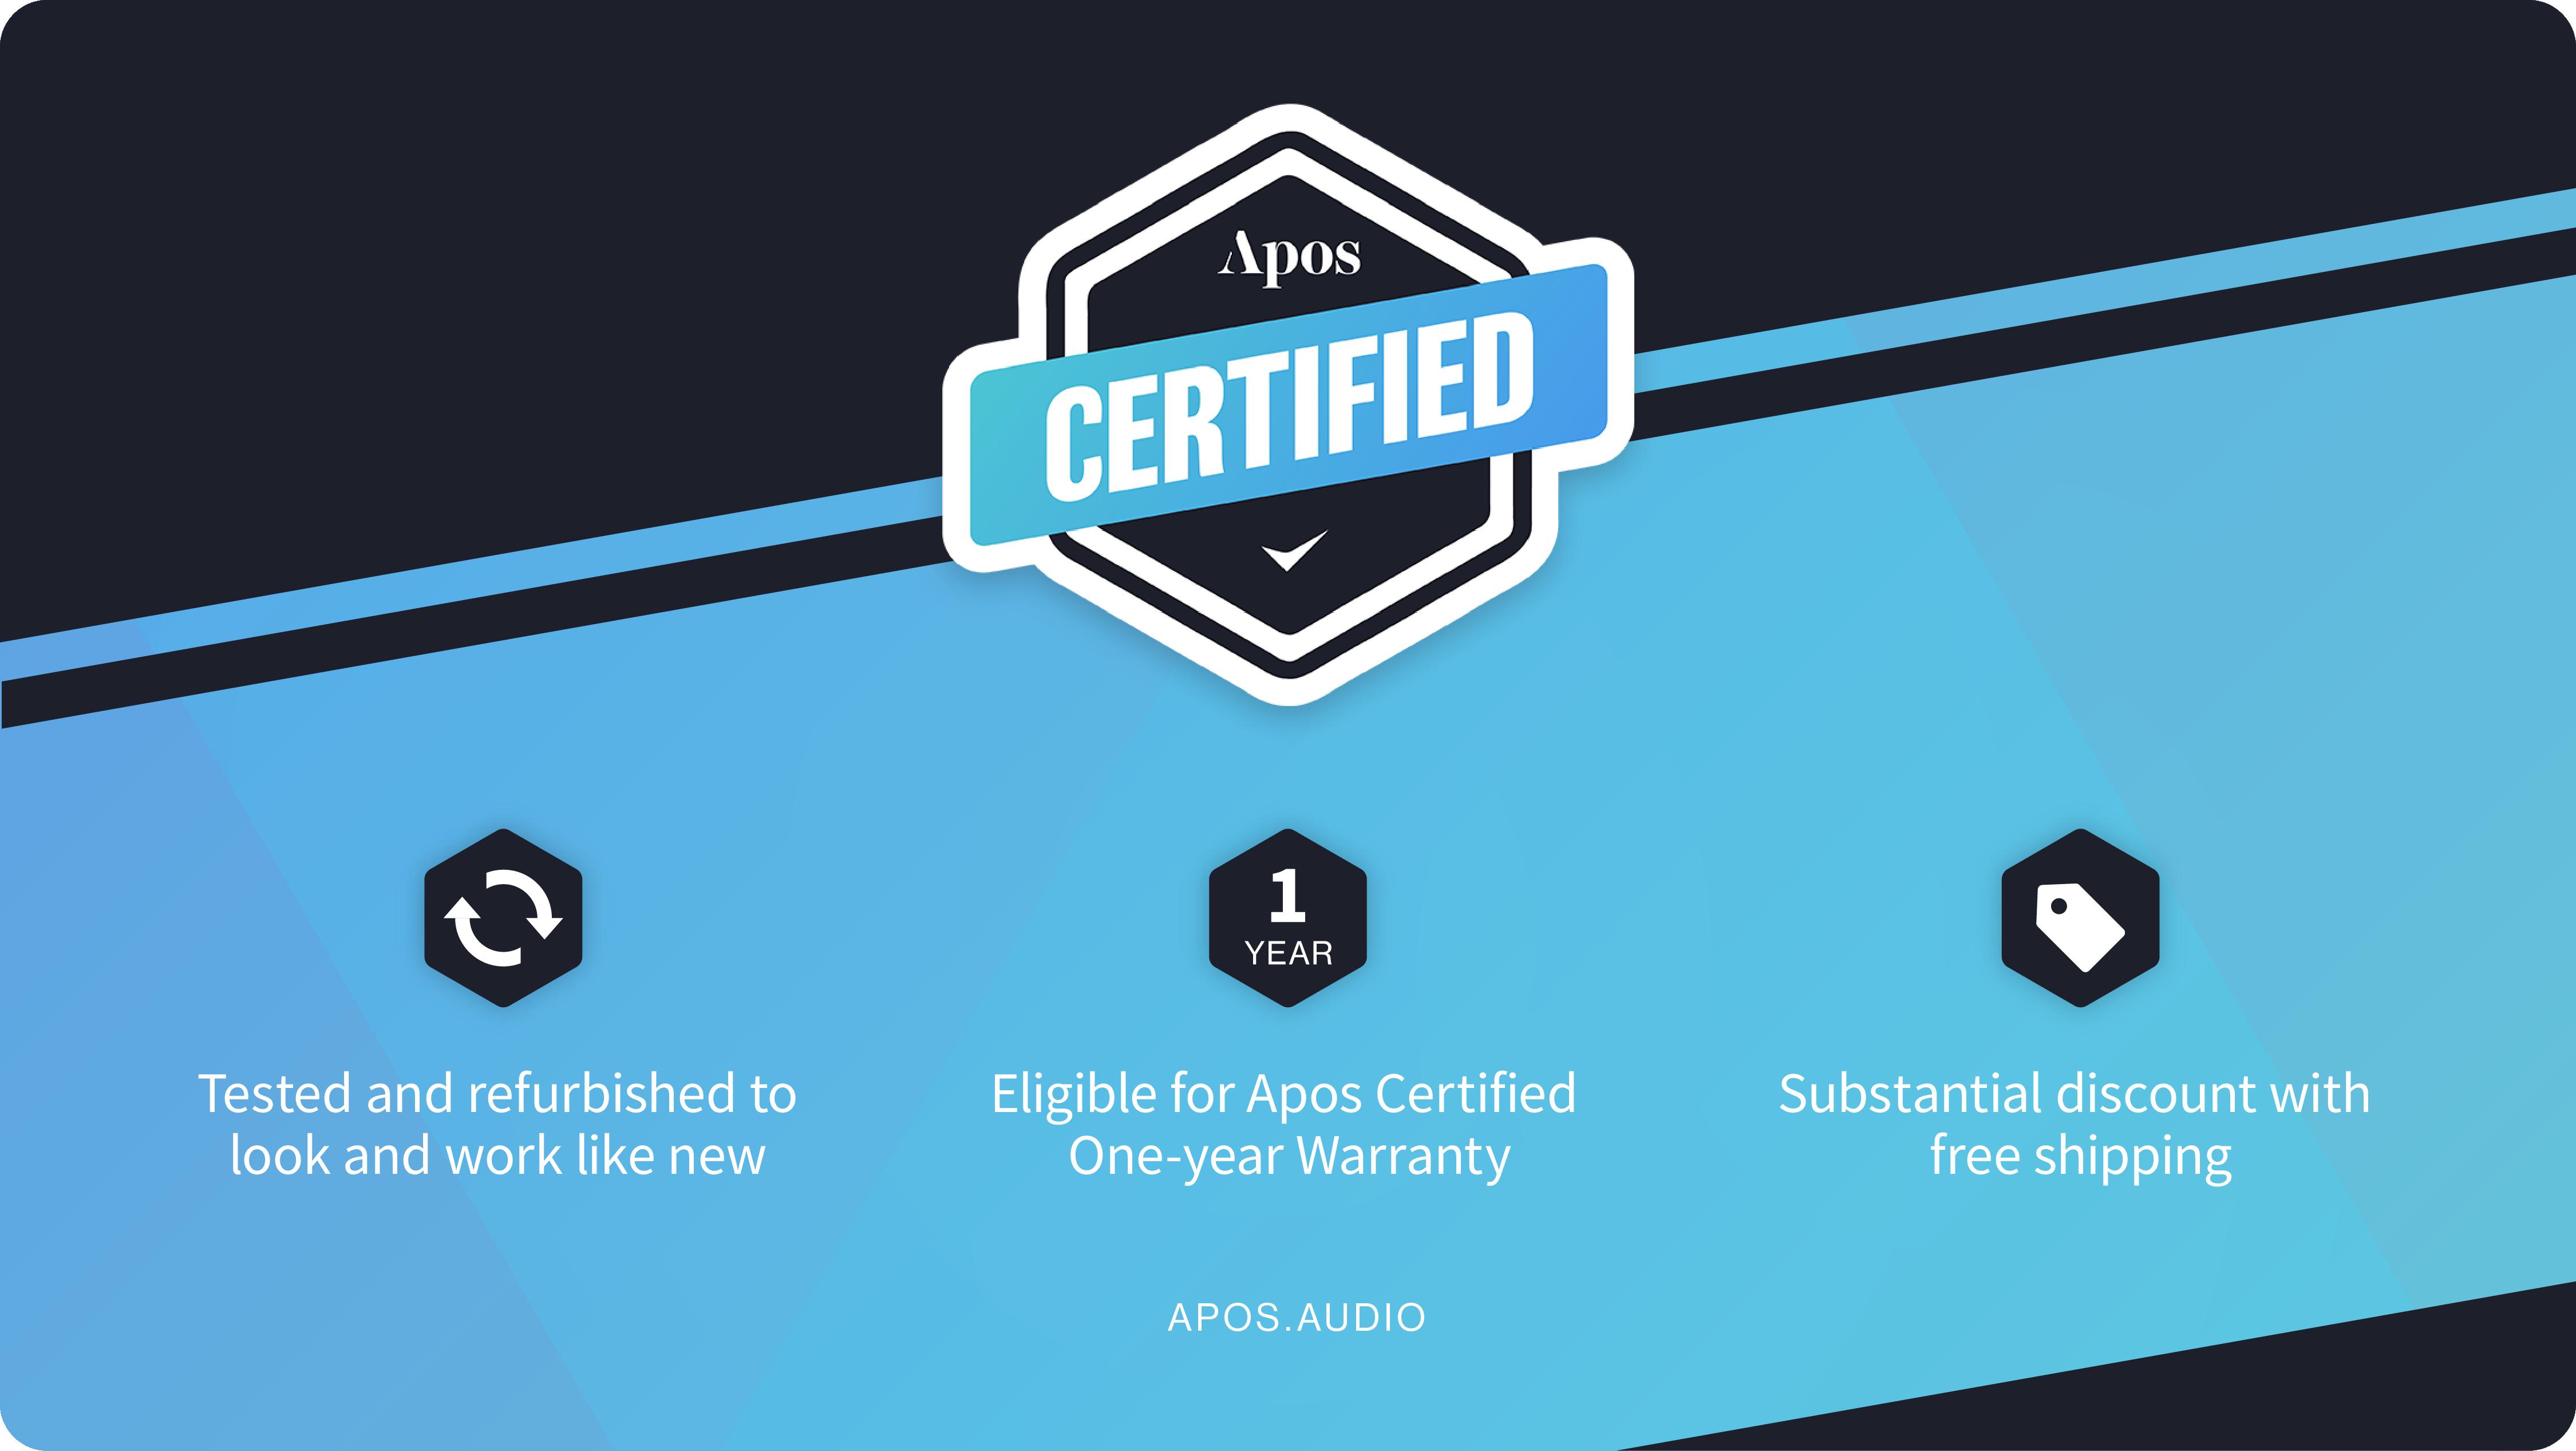 Apos Certified